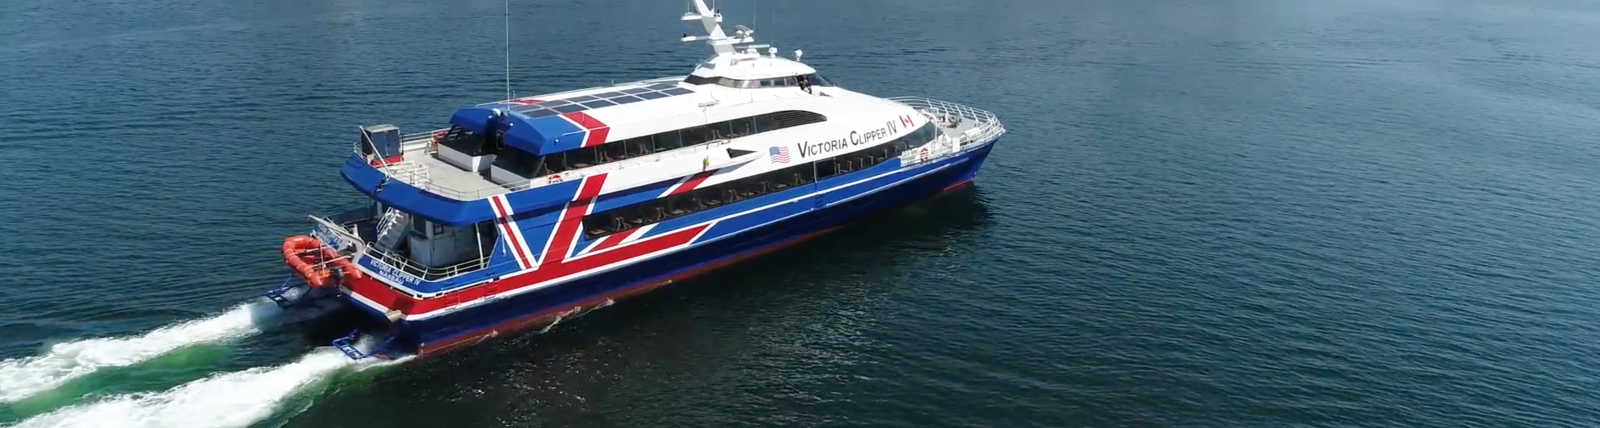 The Victoria Clipper IV in Victoria's Inner Harbour